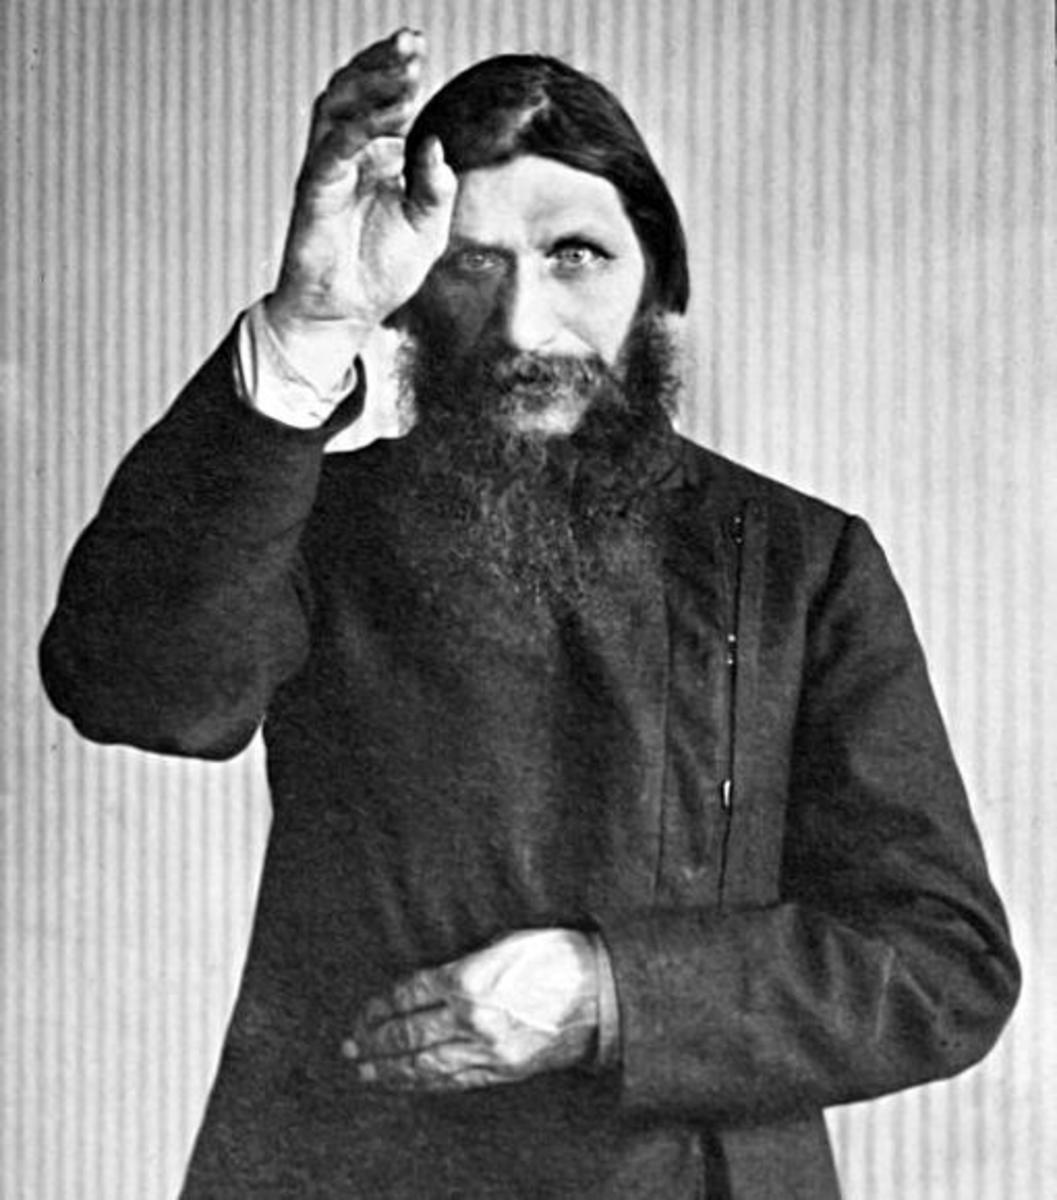 Tsarina Alexandra believed that God could speak to her through Rasputin.